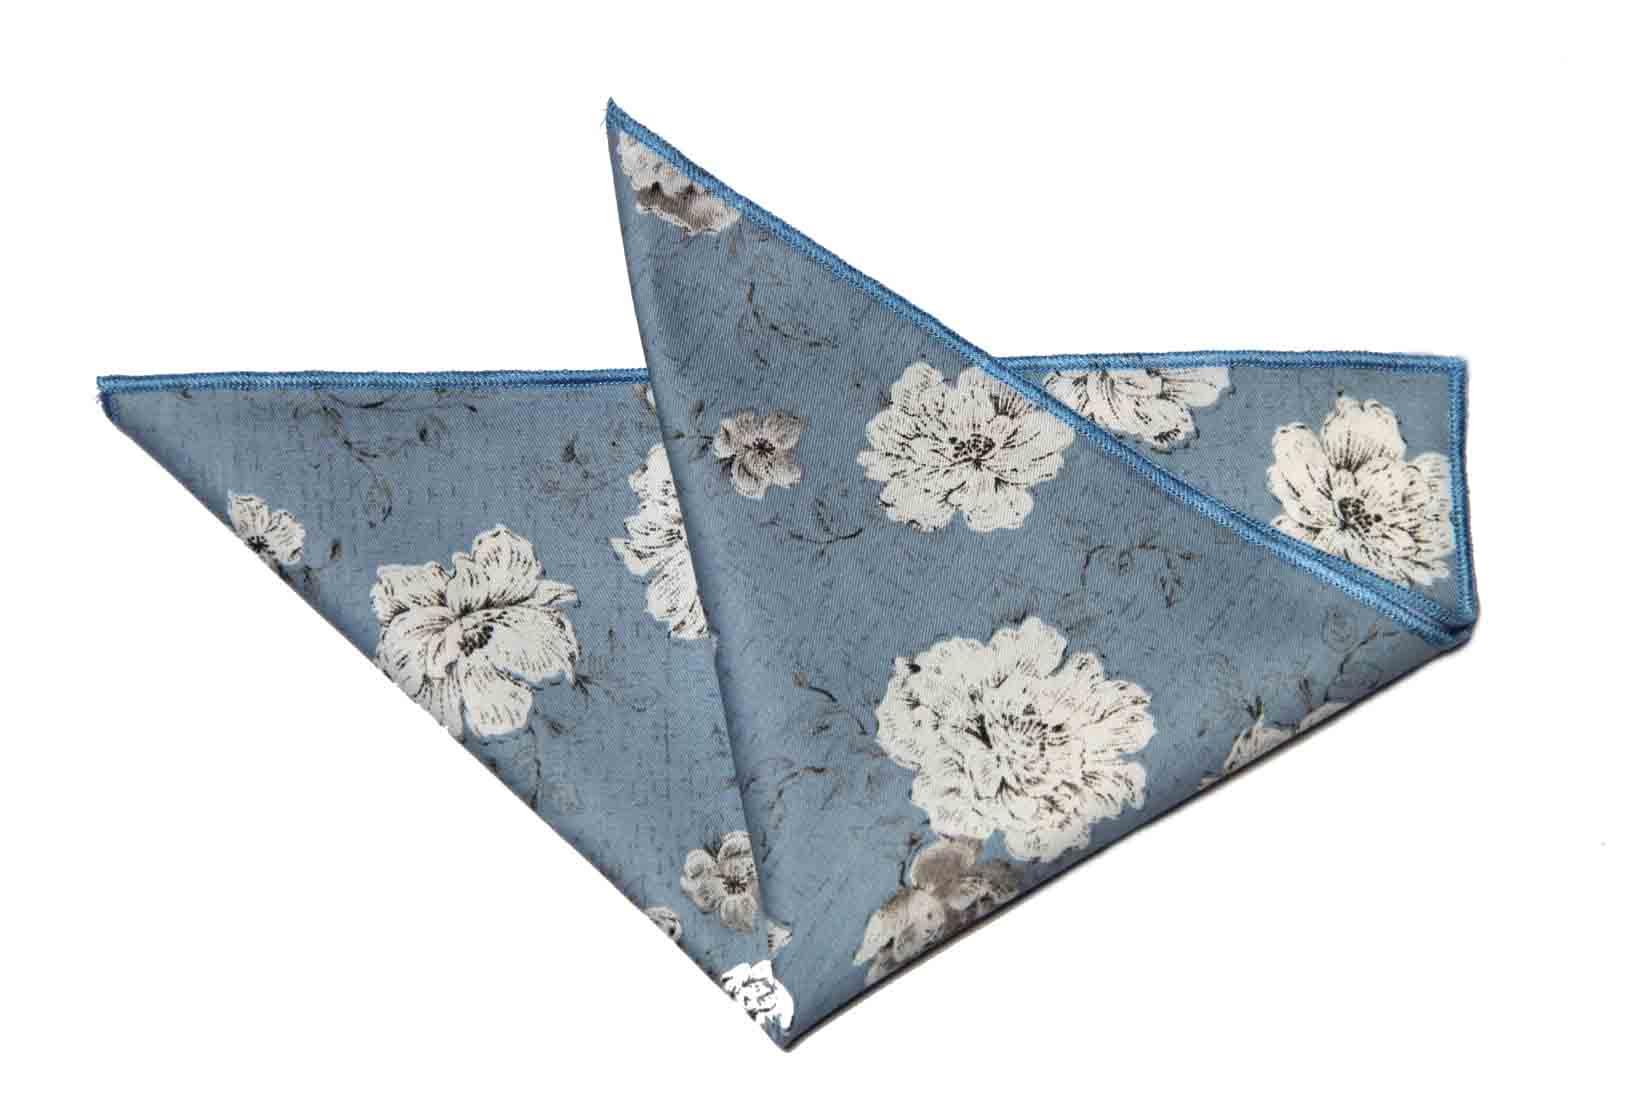 Gascoigne Pocket Square Cotton Light Blue White Gray Brown Floral Men's